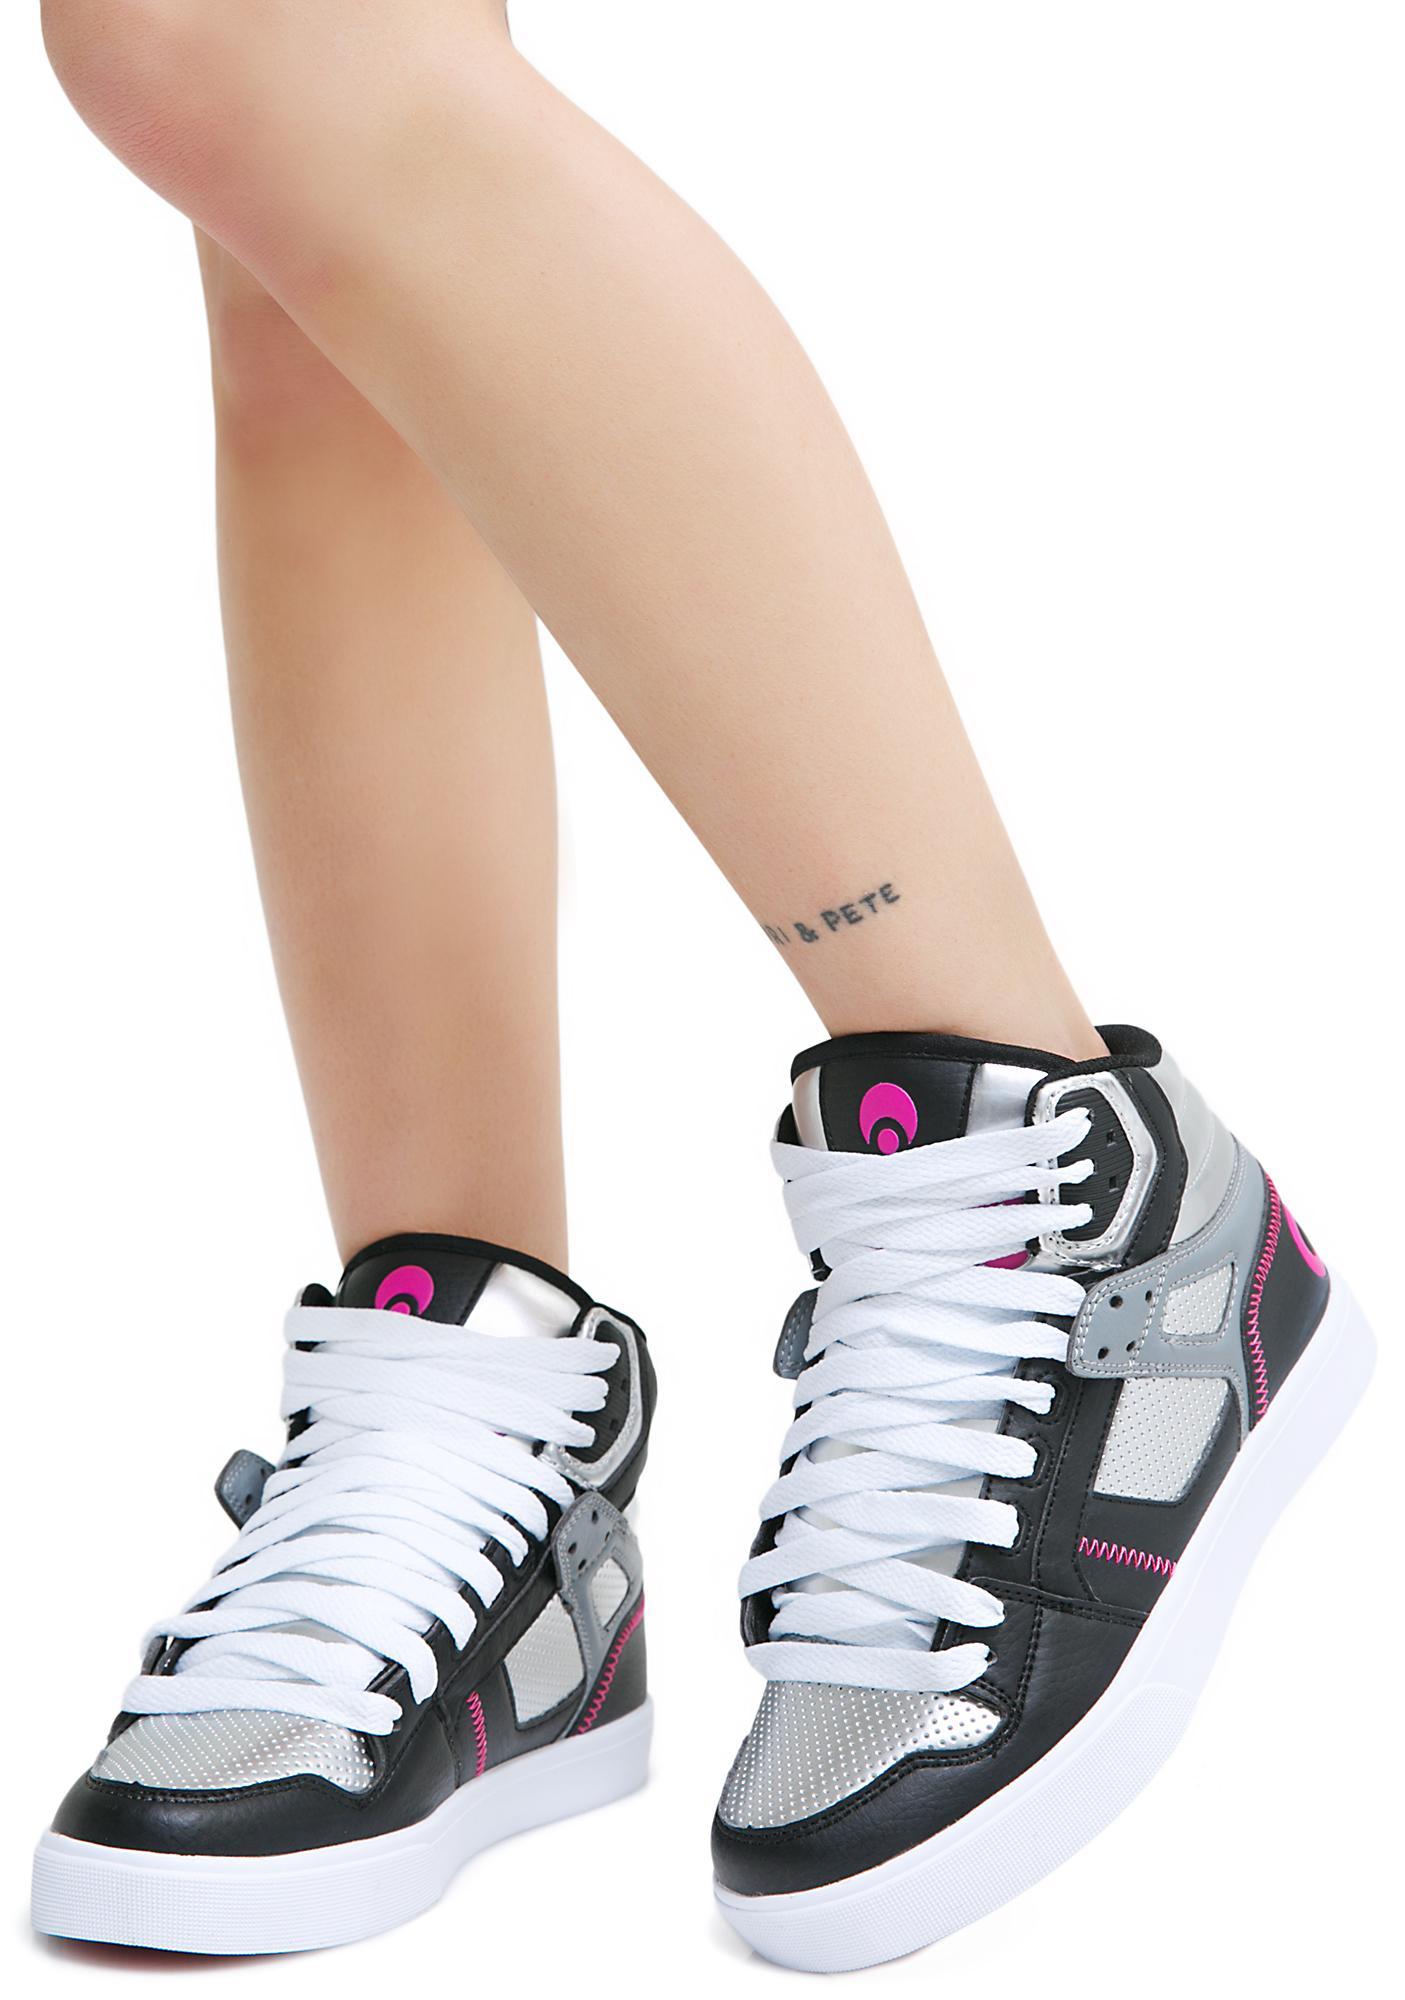 5656b1a2c36 Osiris Stone Clone Sneakers; Osiris Stone Clone Sneakers ...